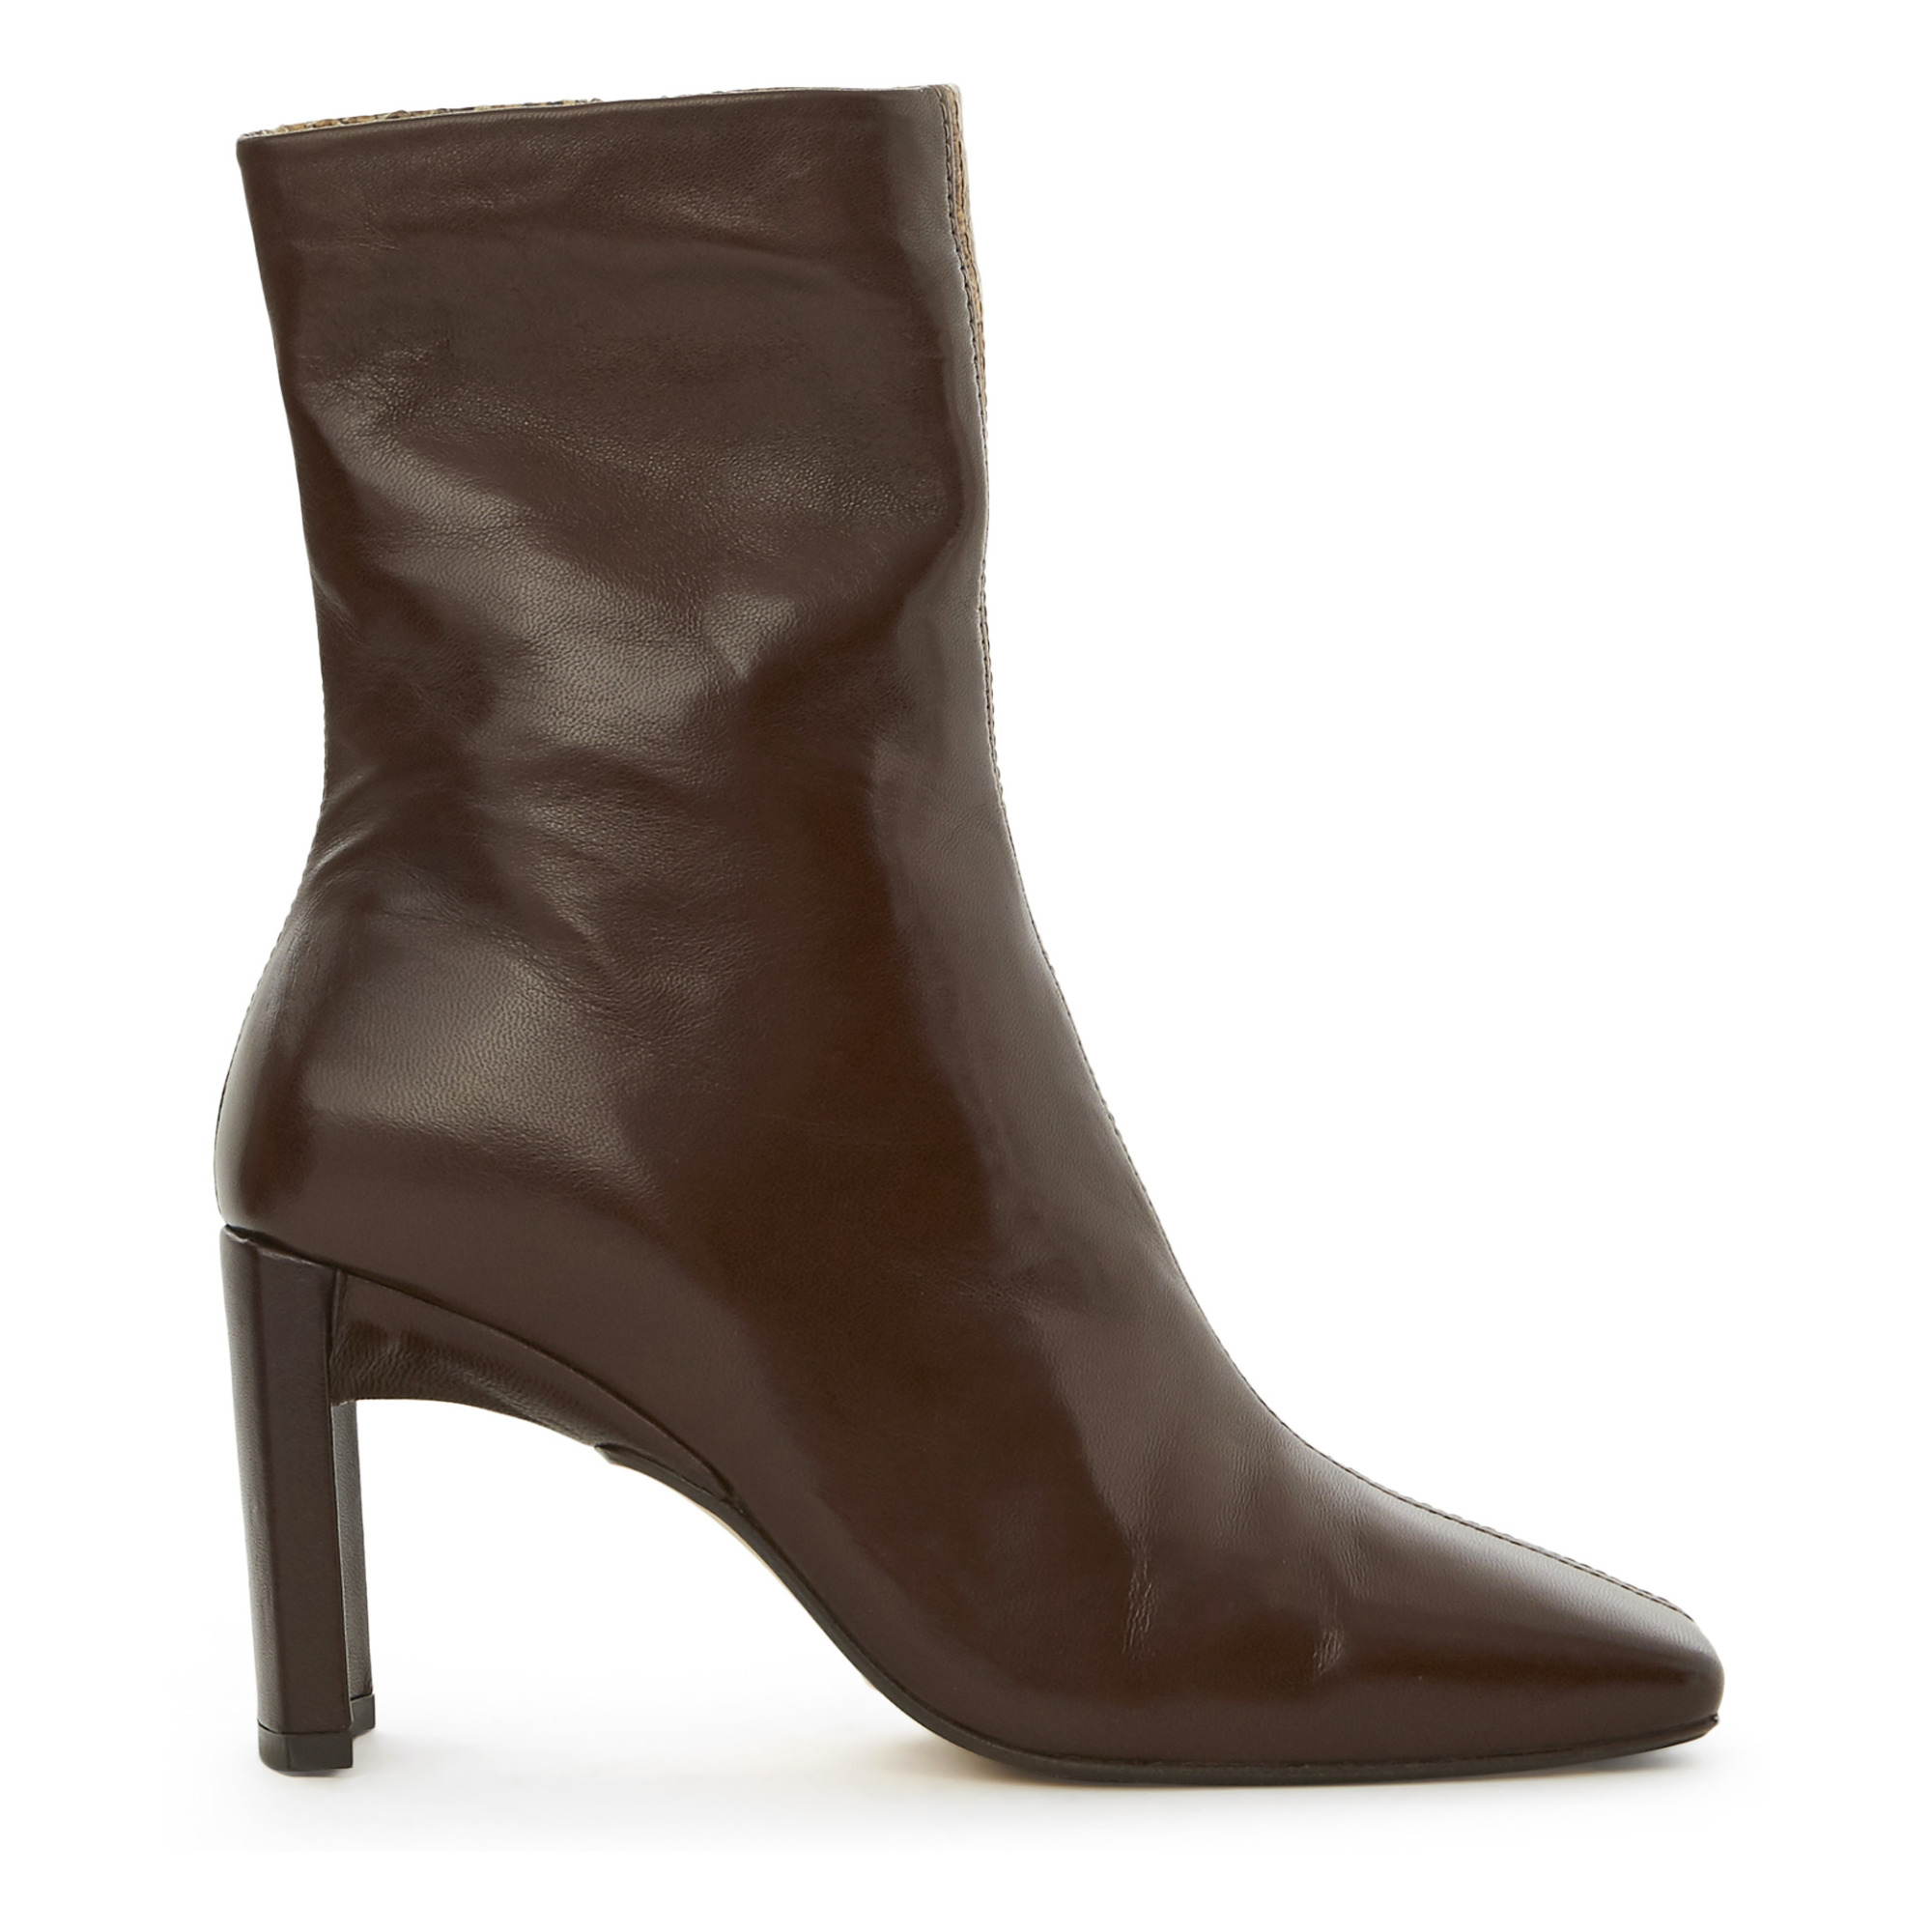 Ekatarina Two-Tone Snake Print Ankle Boots